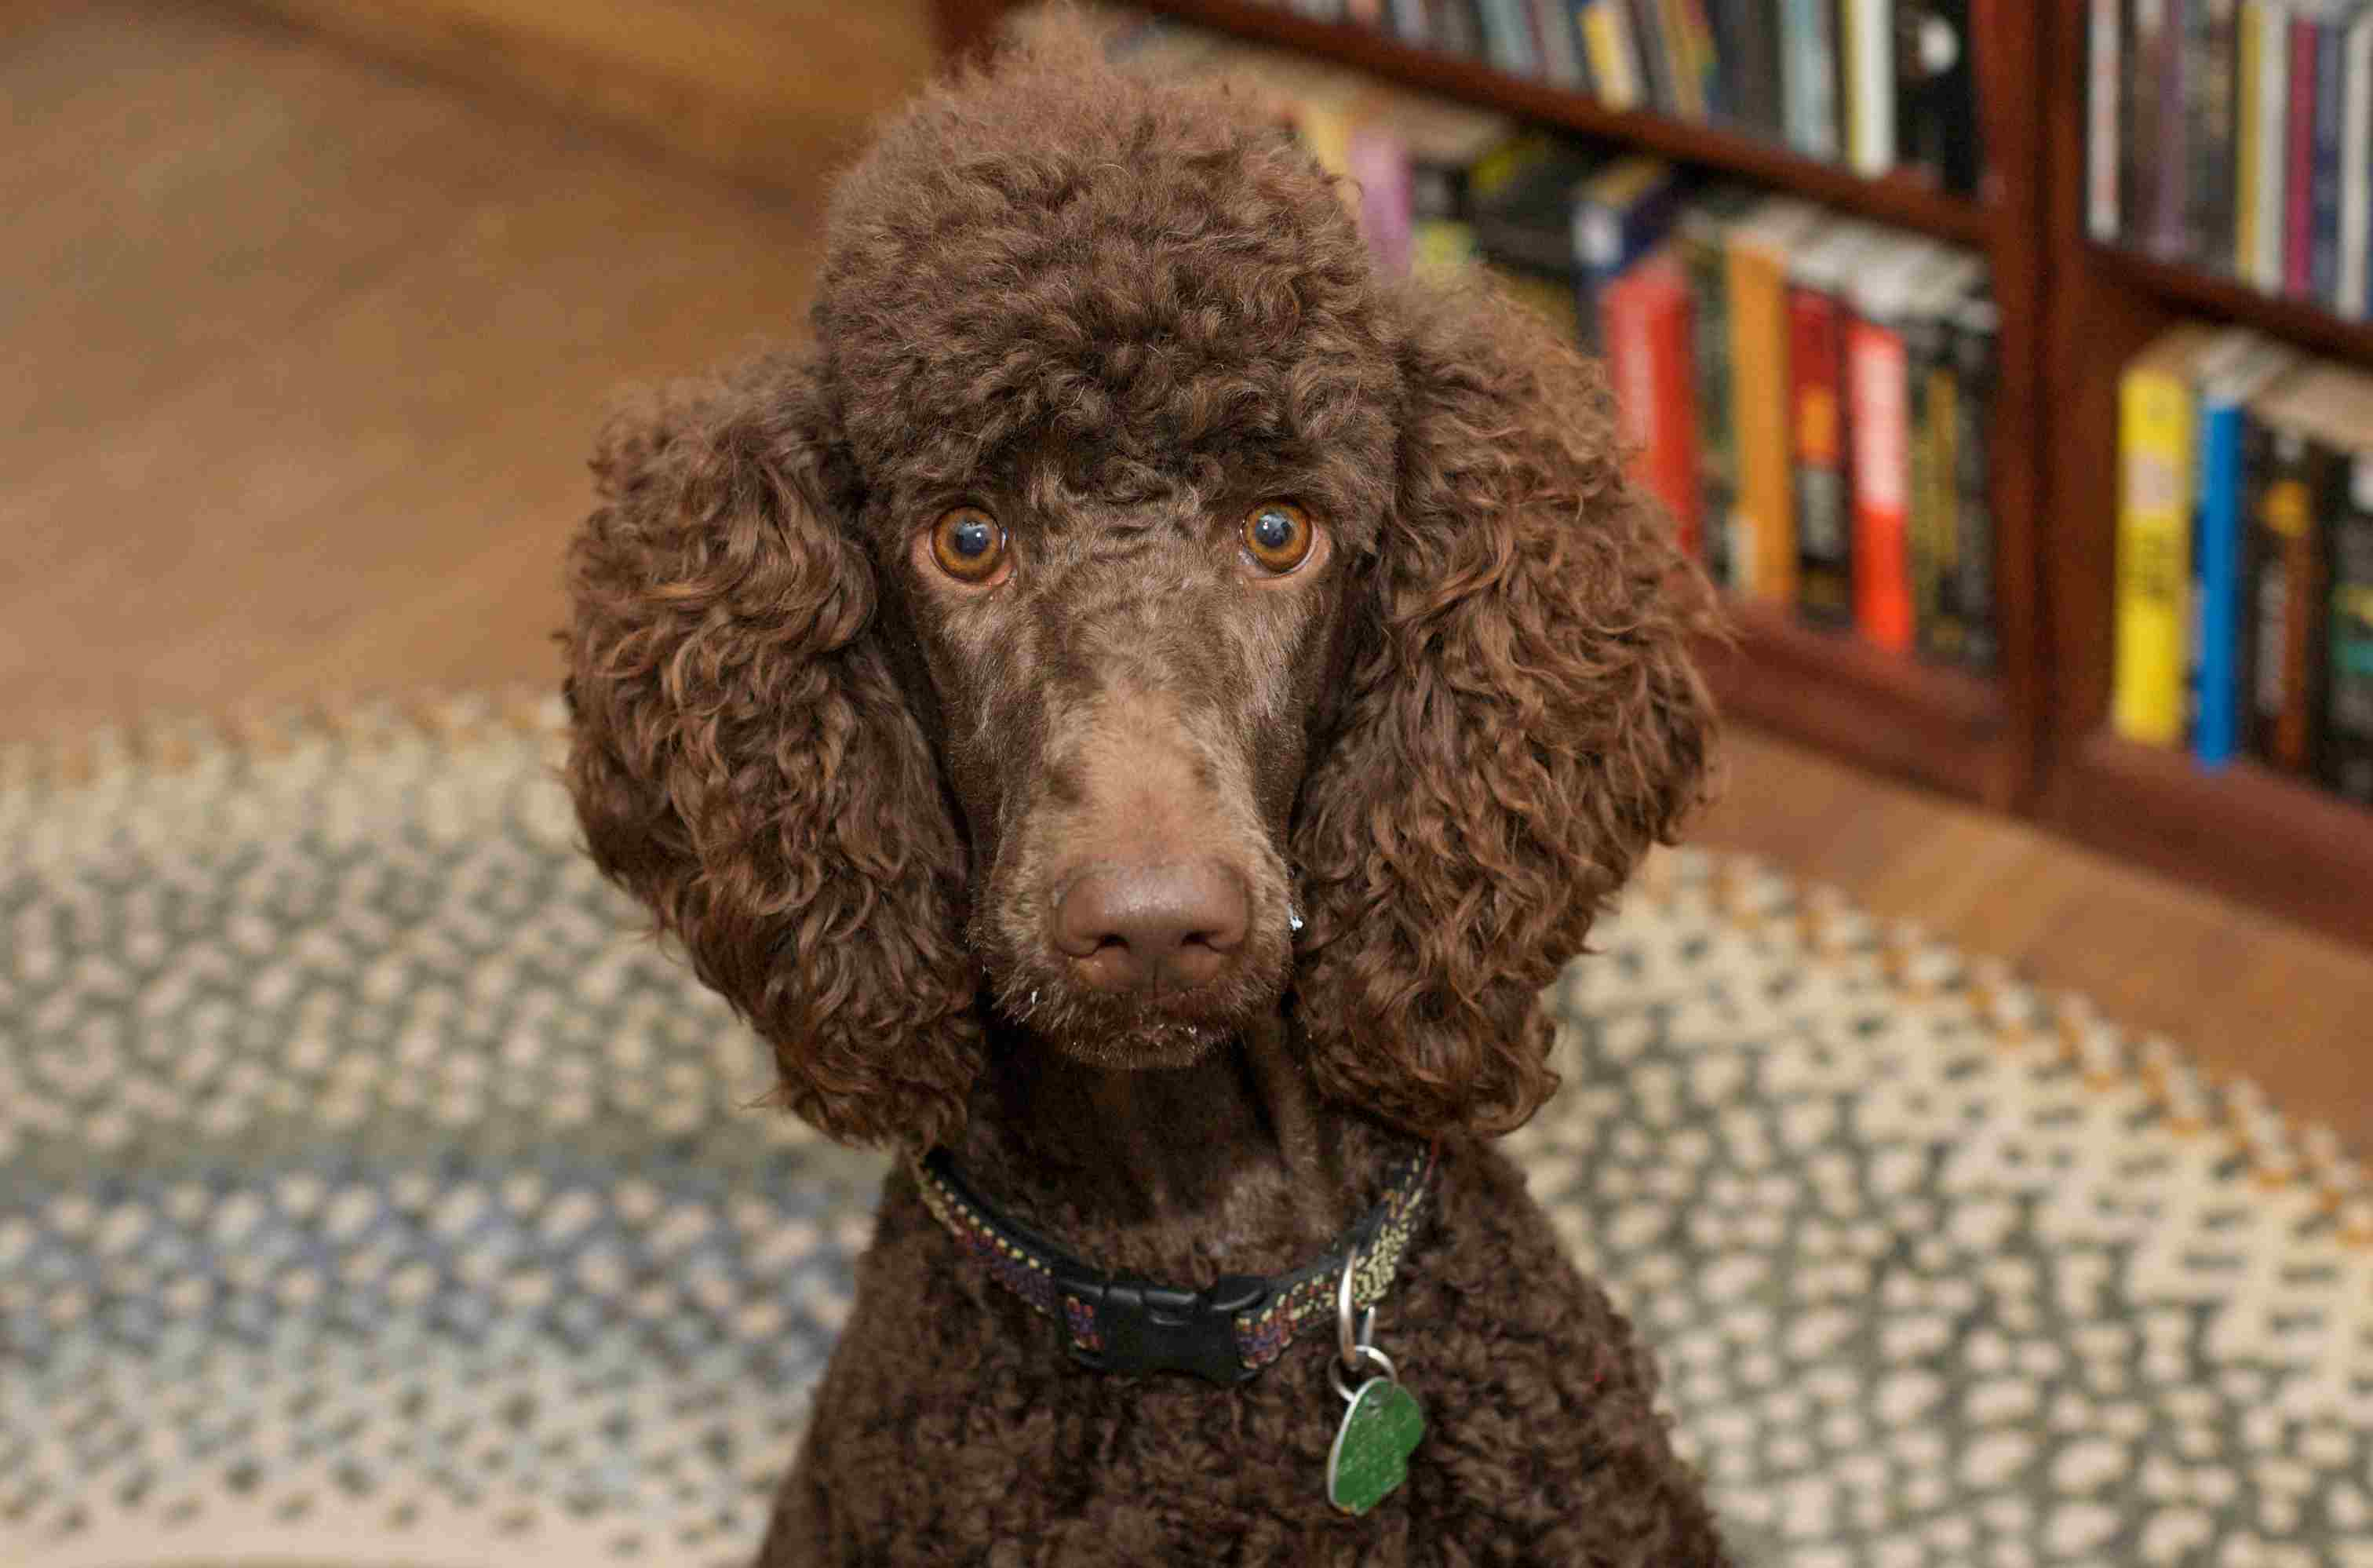 Chocolate poodle by a bookshelf